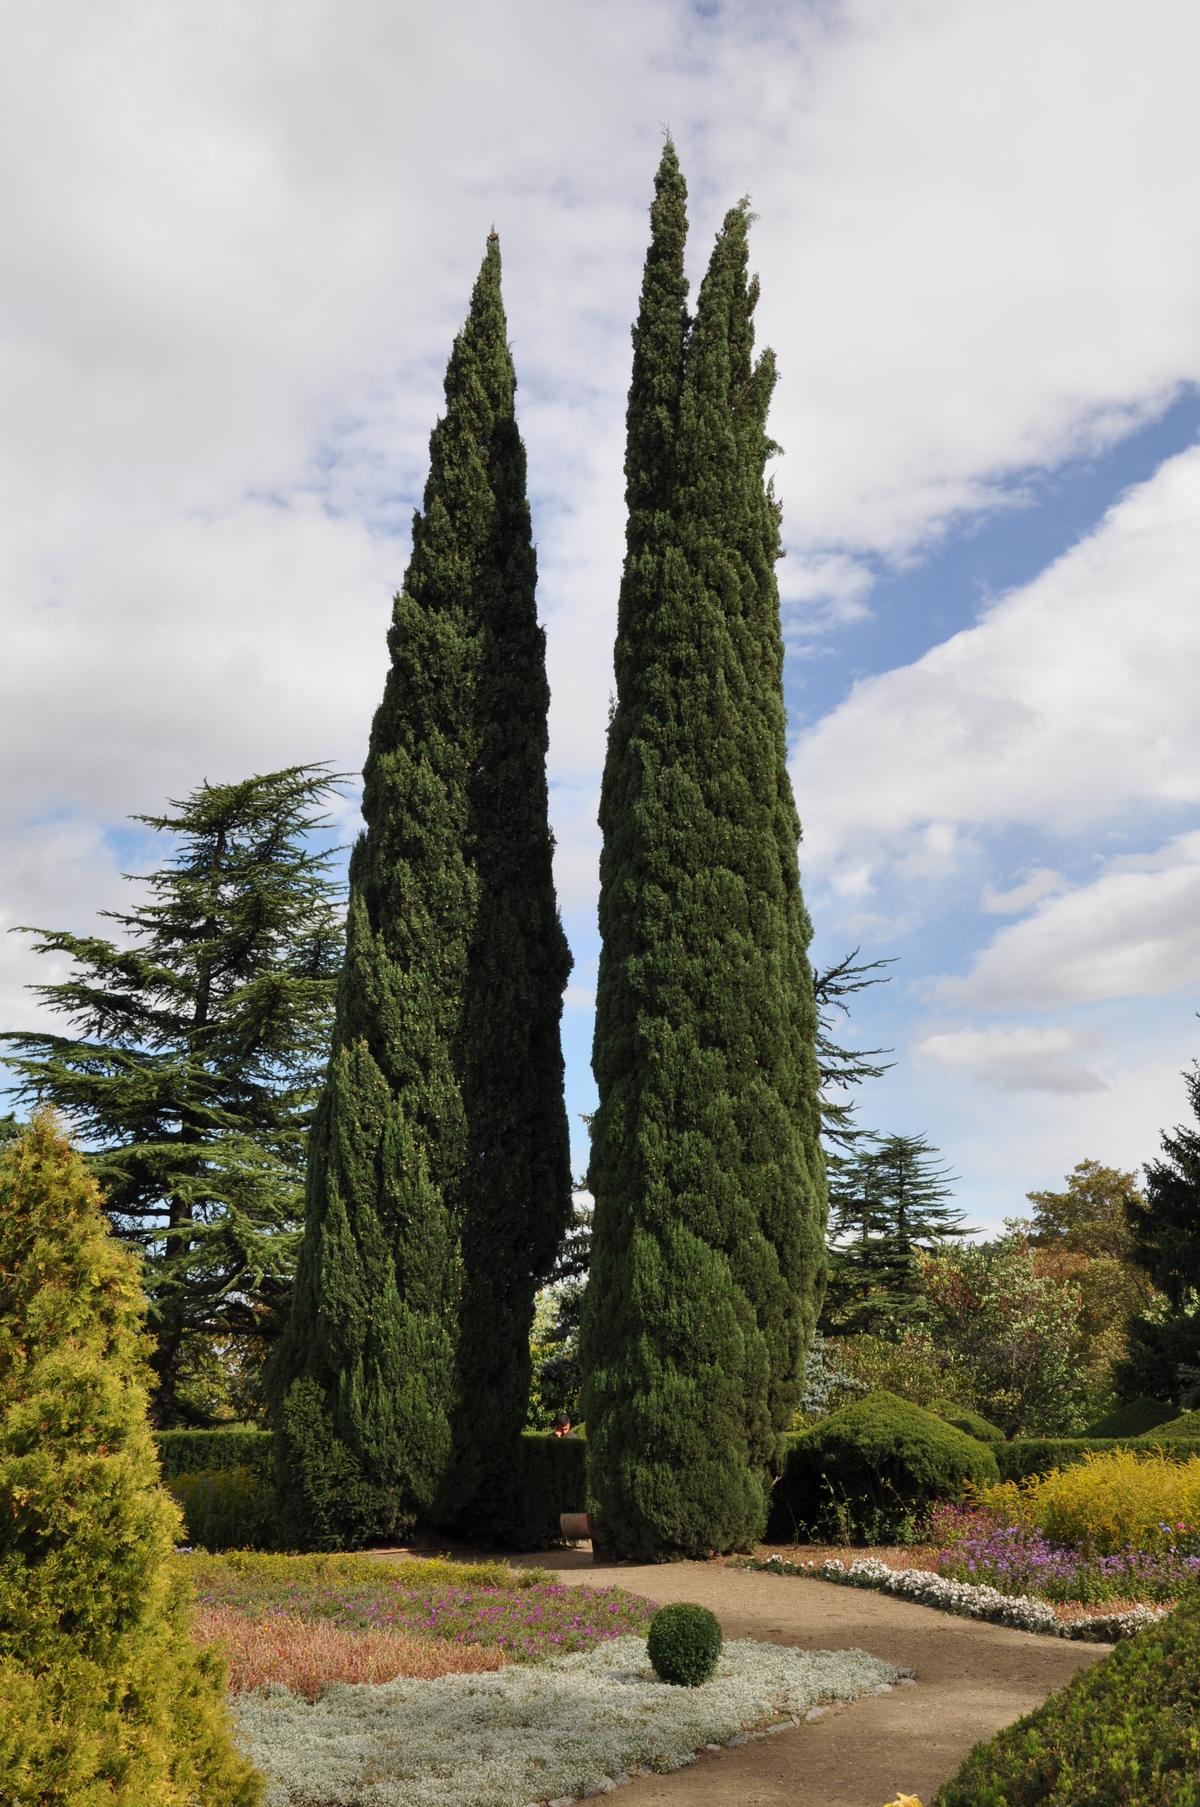 Iso Pinus suku puoli